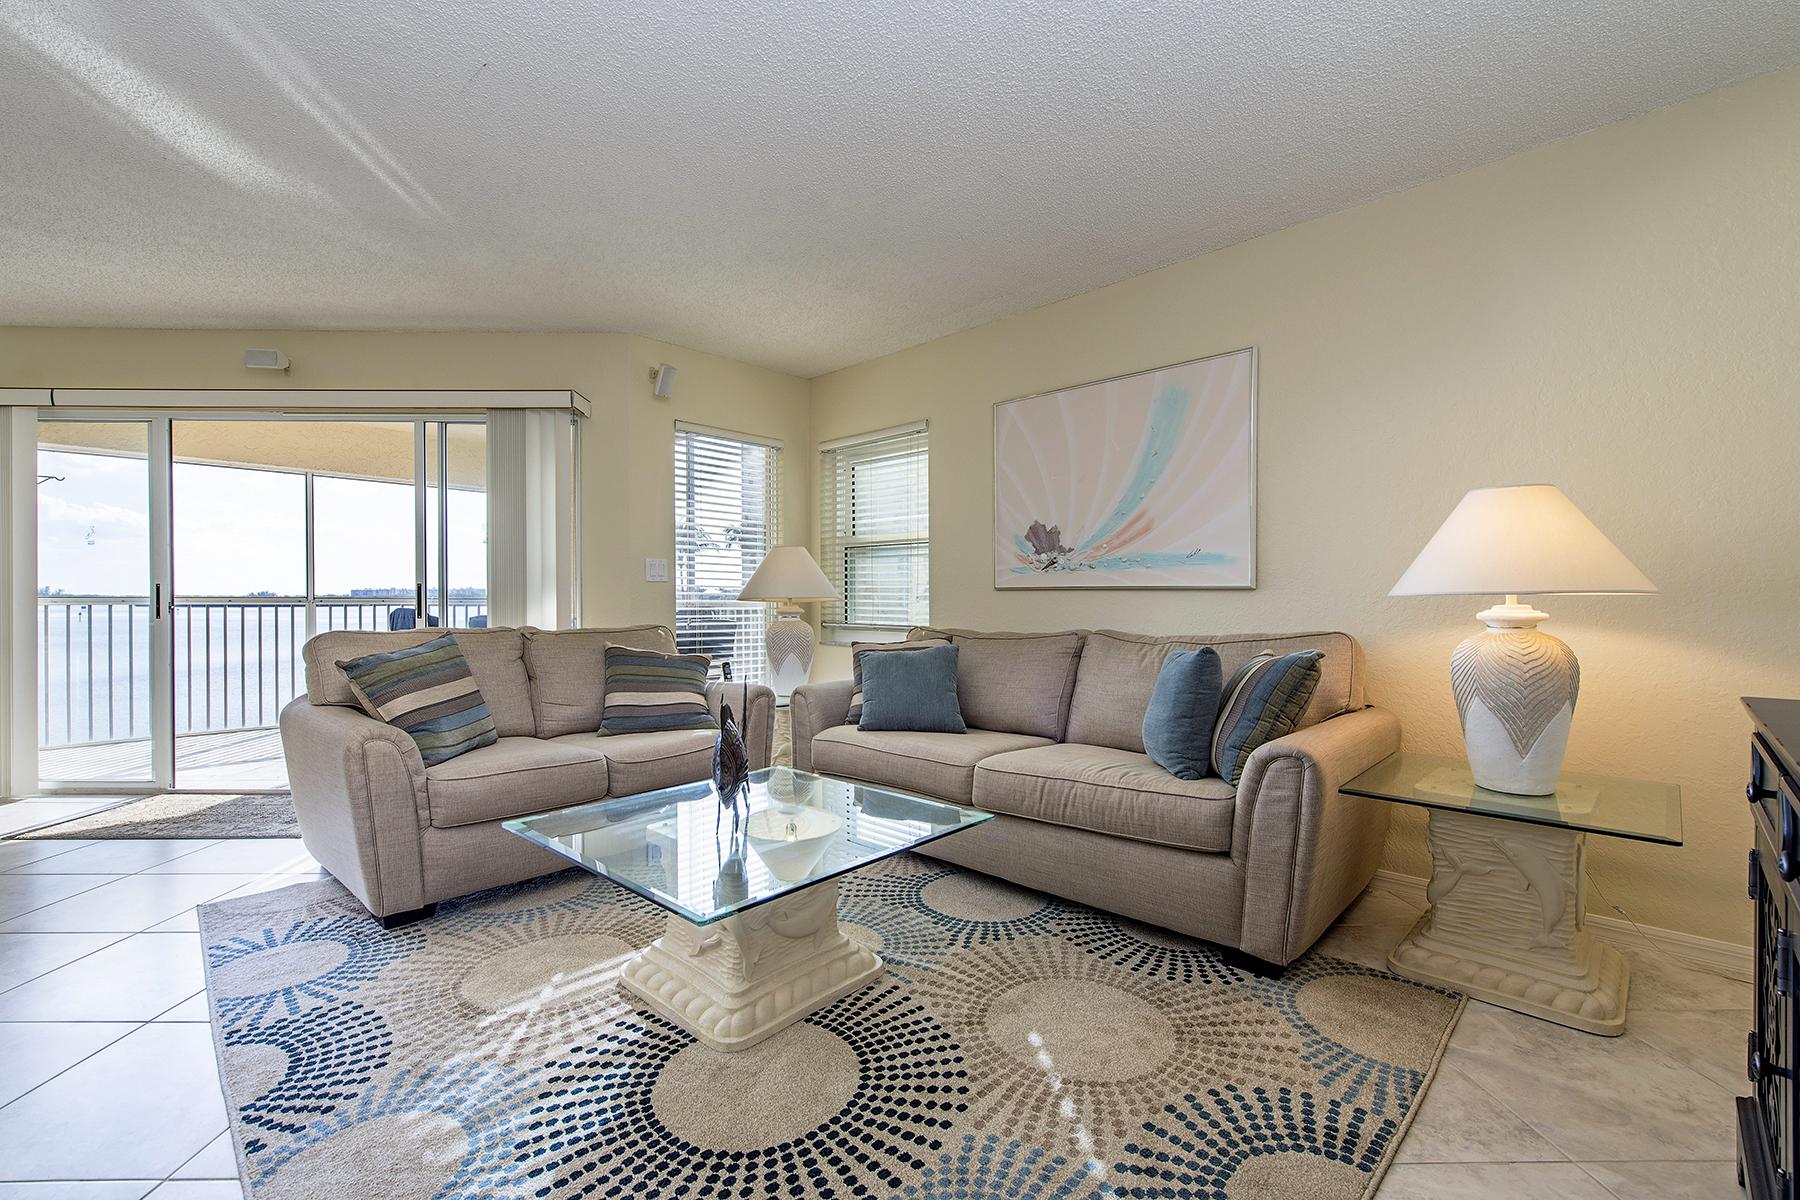 Condominium for Sale at HICKORY BAY WEST 4895 Bonita Beach Rd 208, Bonita Springs, Florida 34134 United States